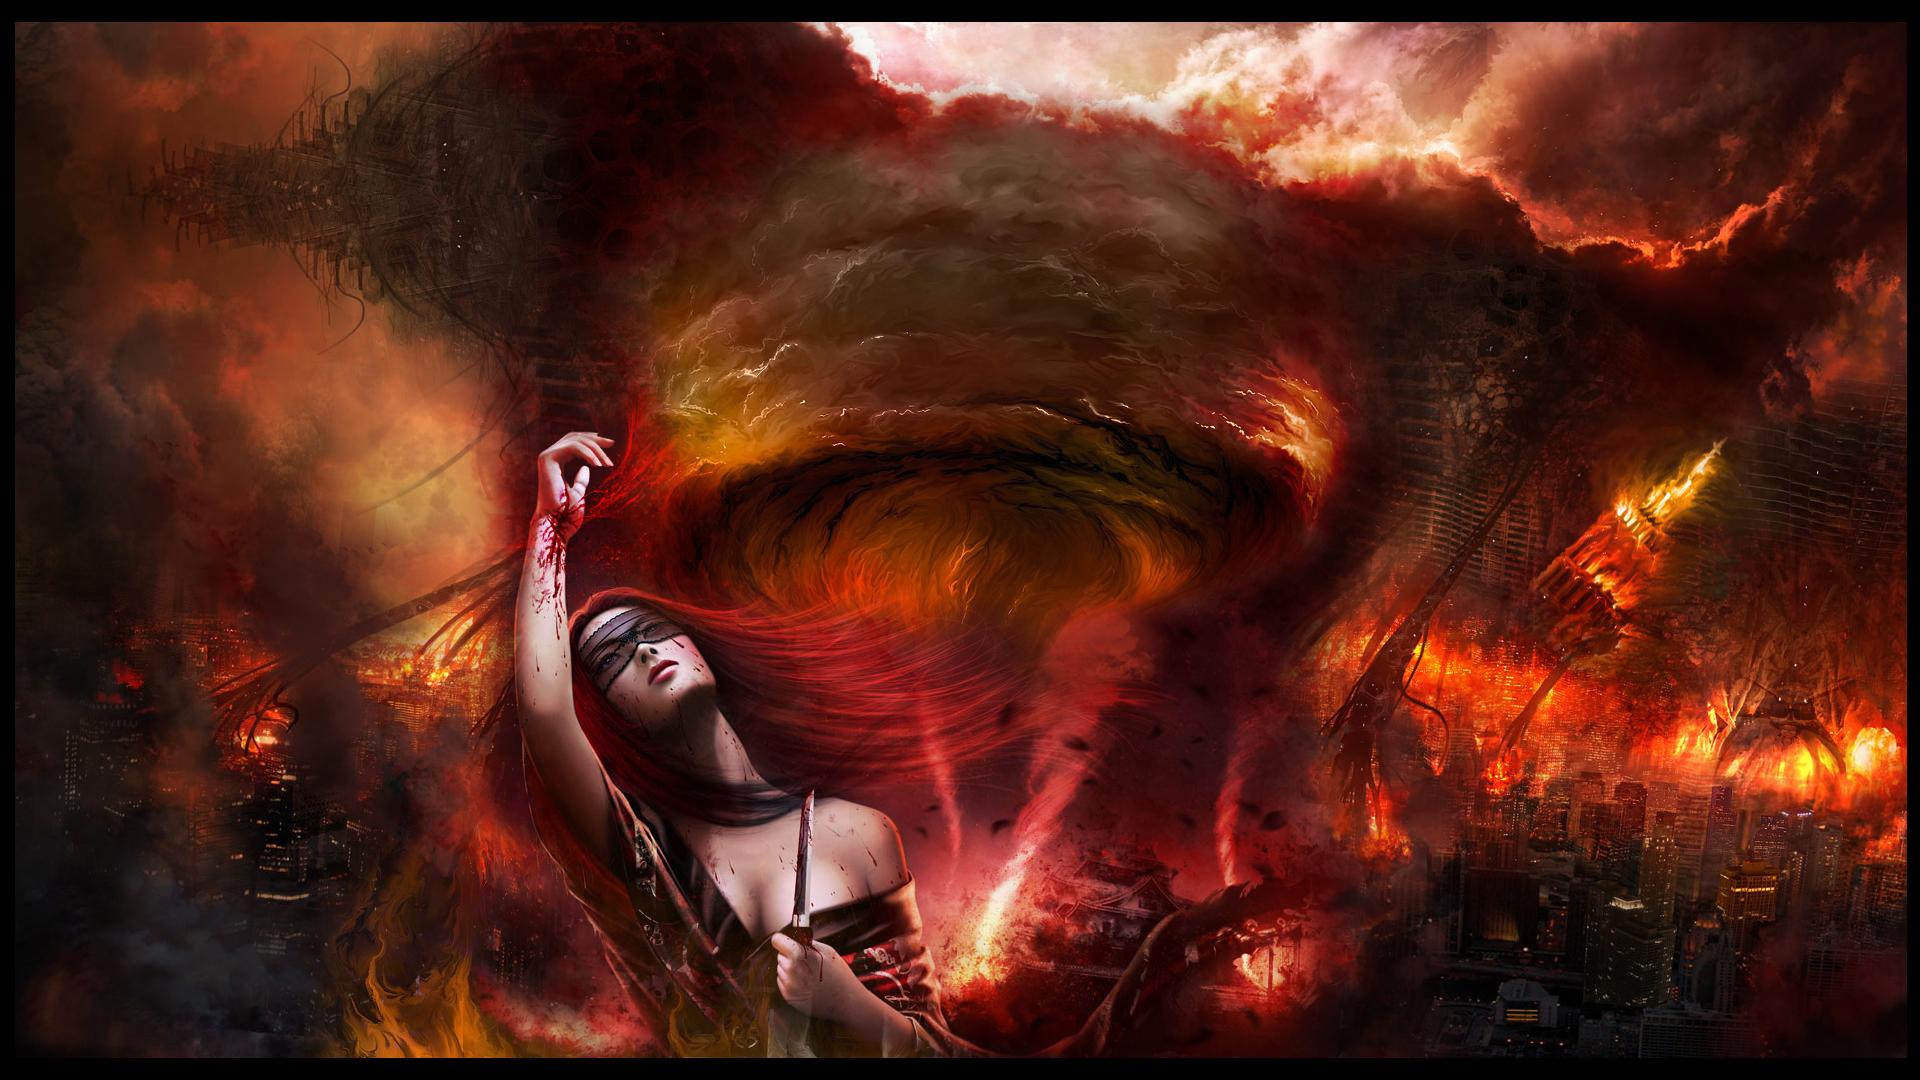 Download desktop wallpaper Blood Ritual Armageddon 1920x1080